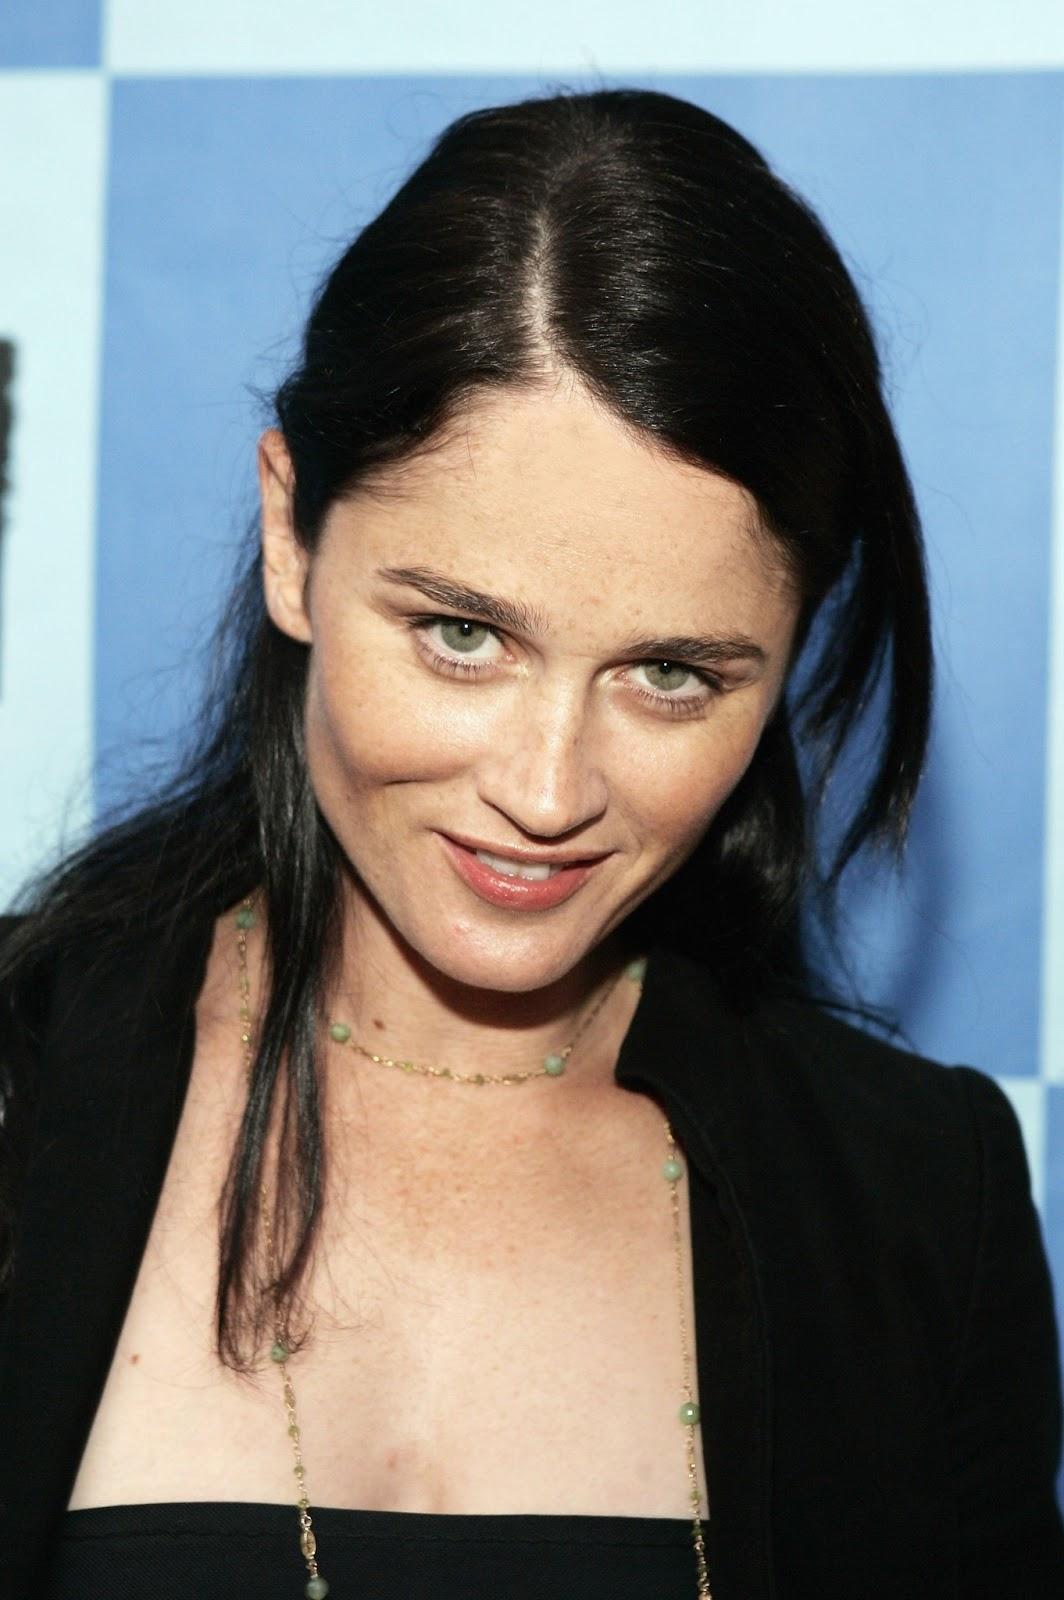 Robin Tunney Photos - Actress Photosz